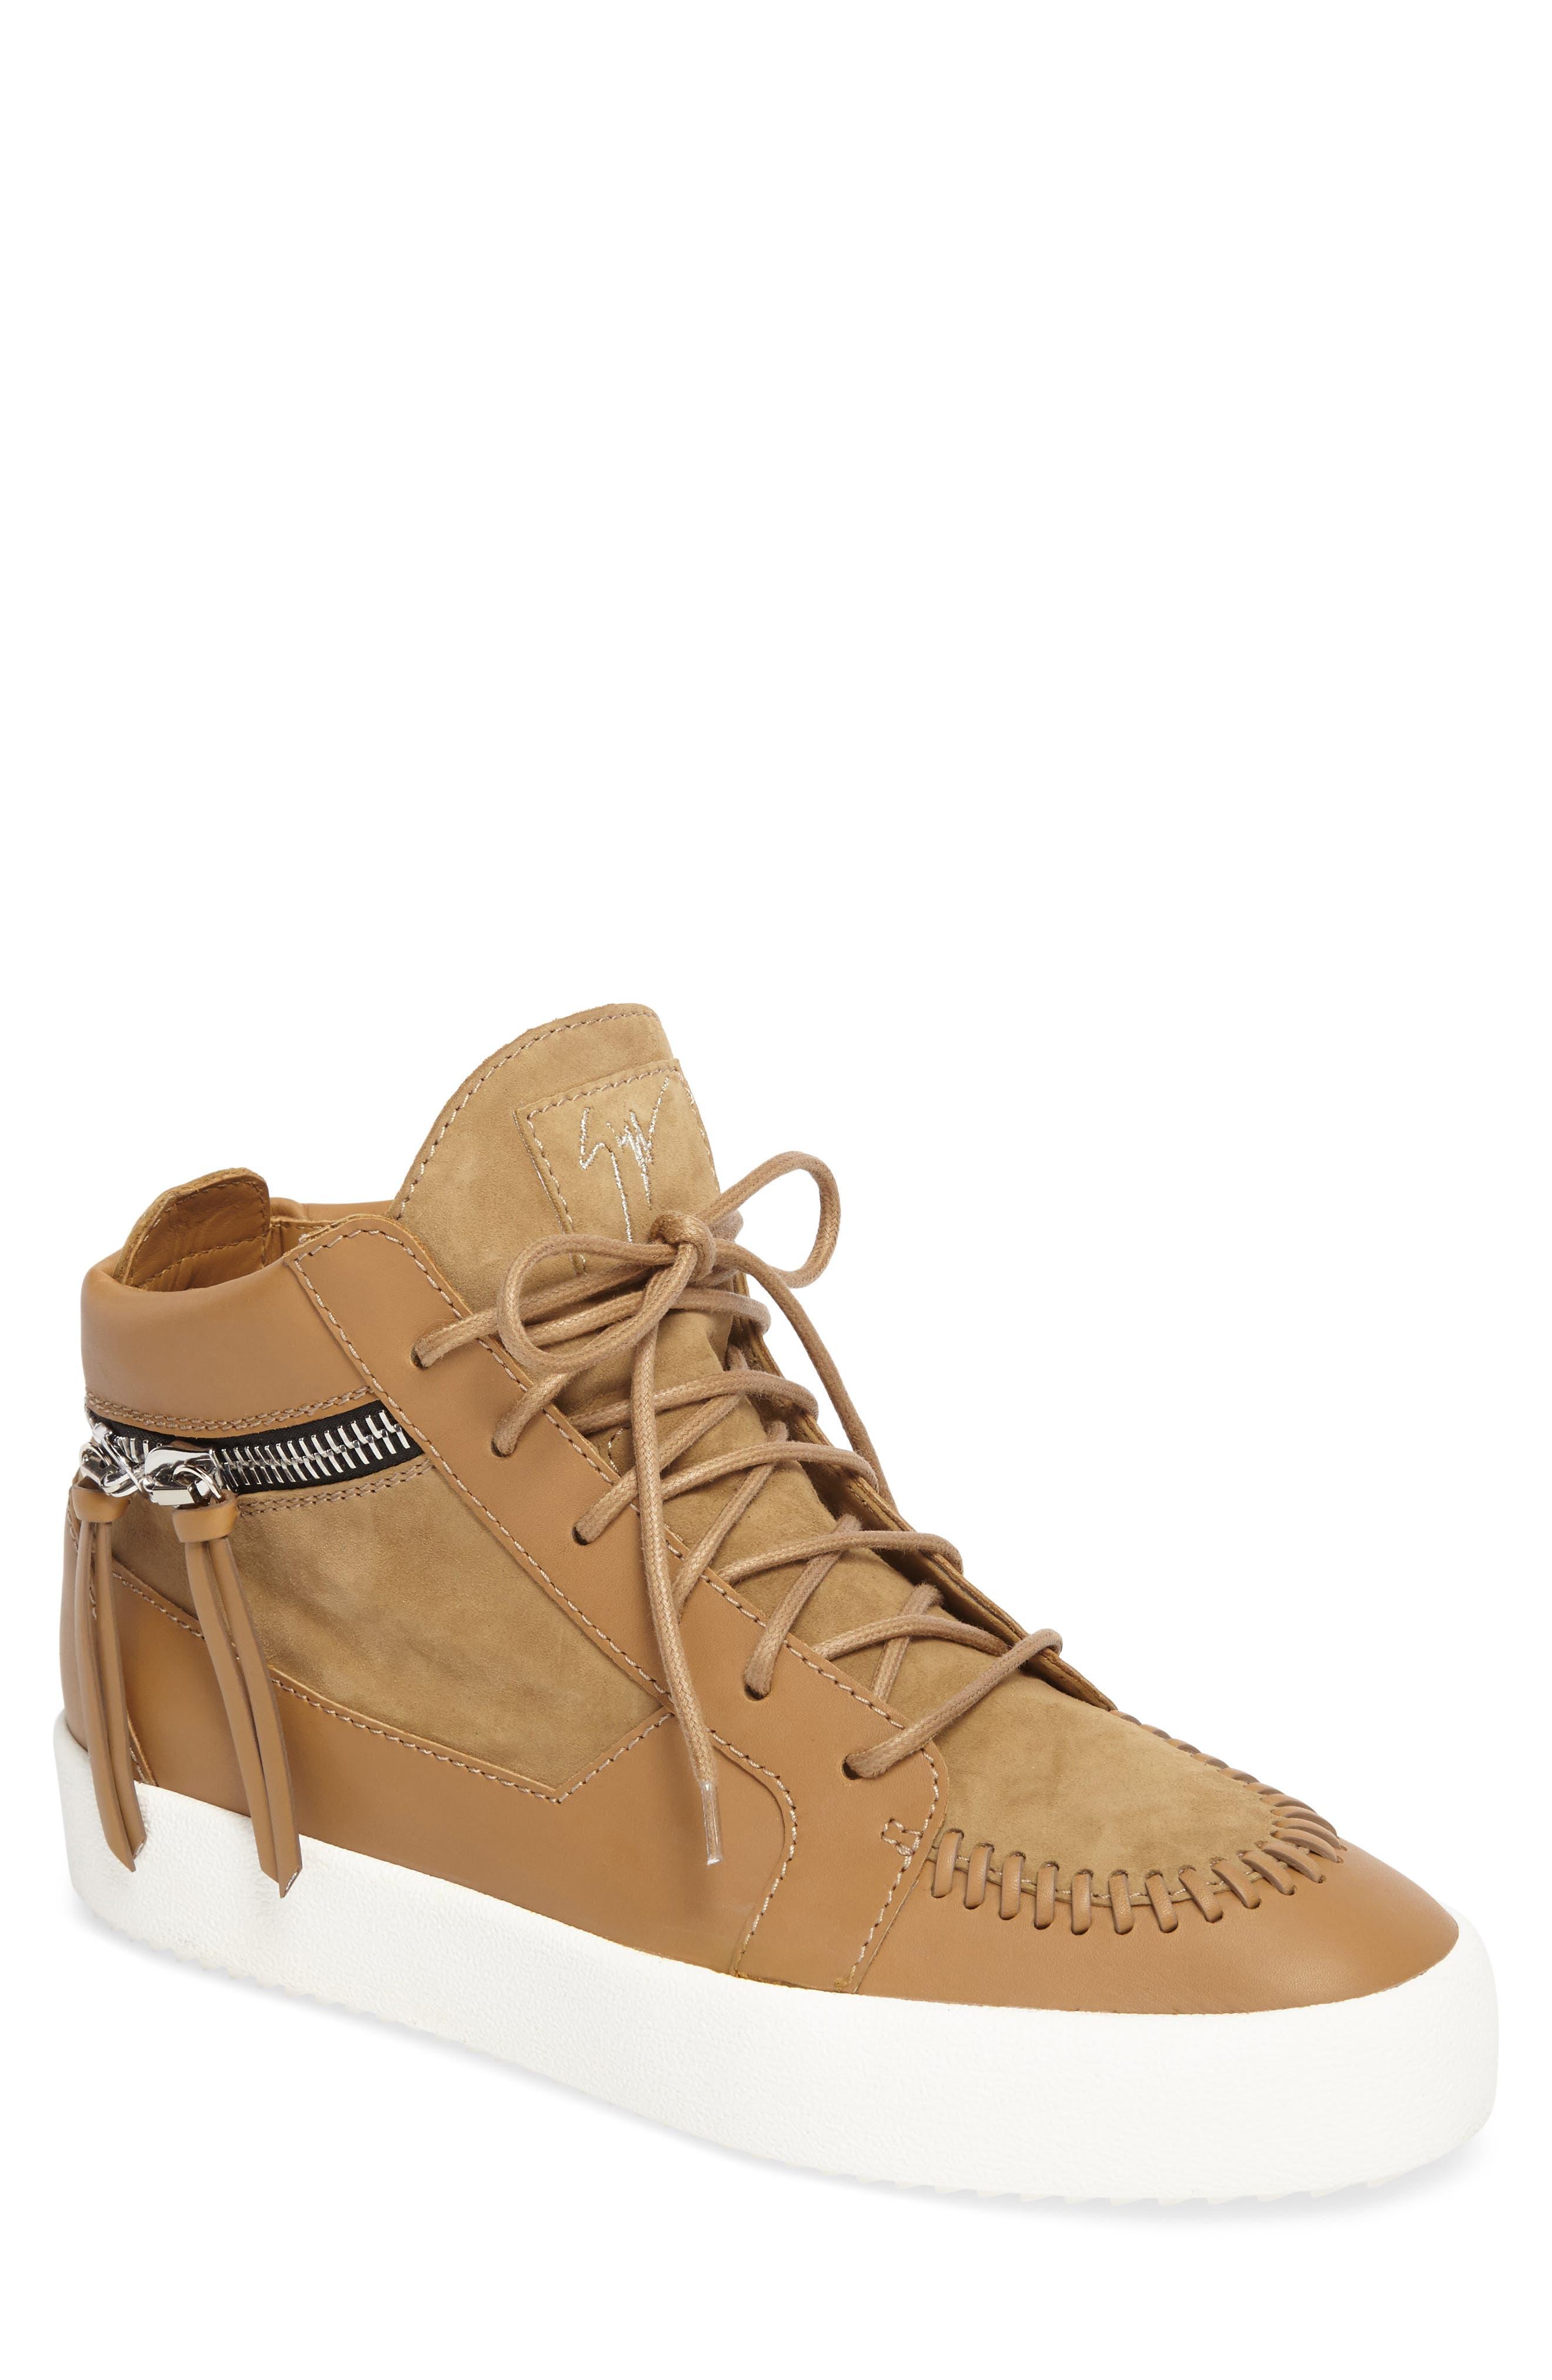 Mid-Top Sneaker,                             Main thumbnail 1, color,                             206